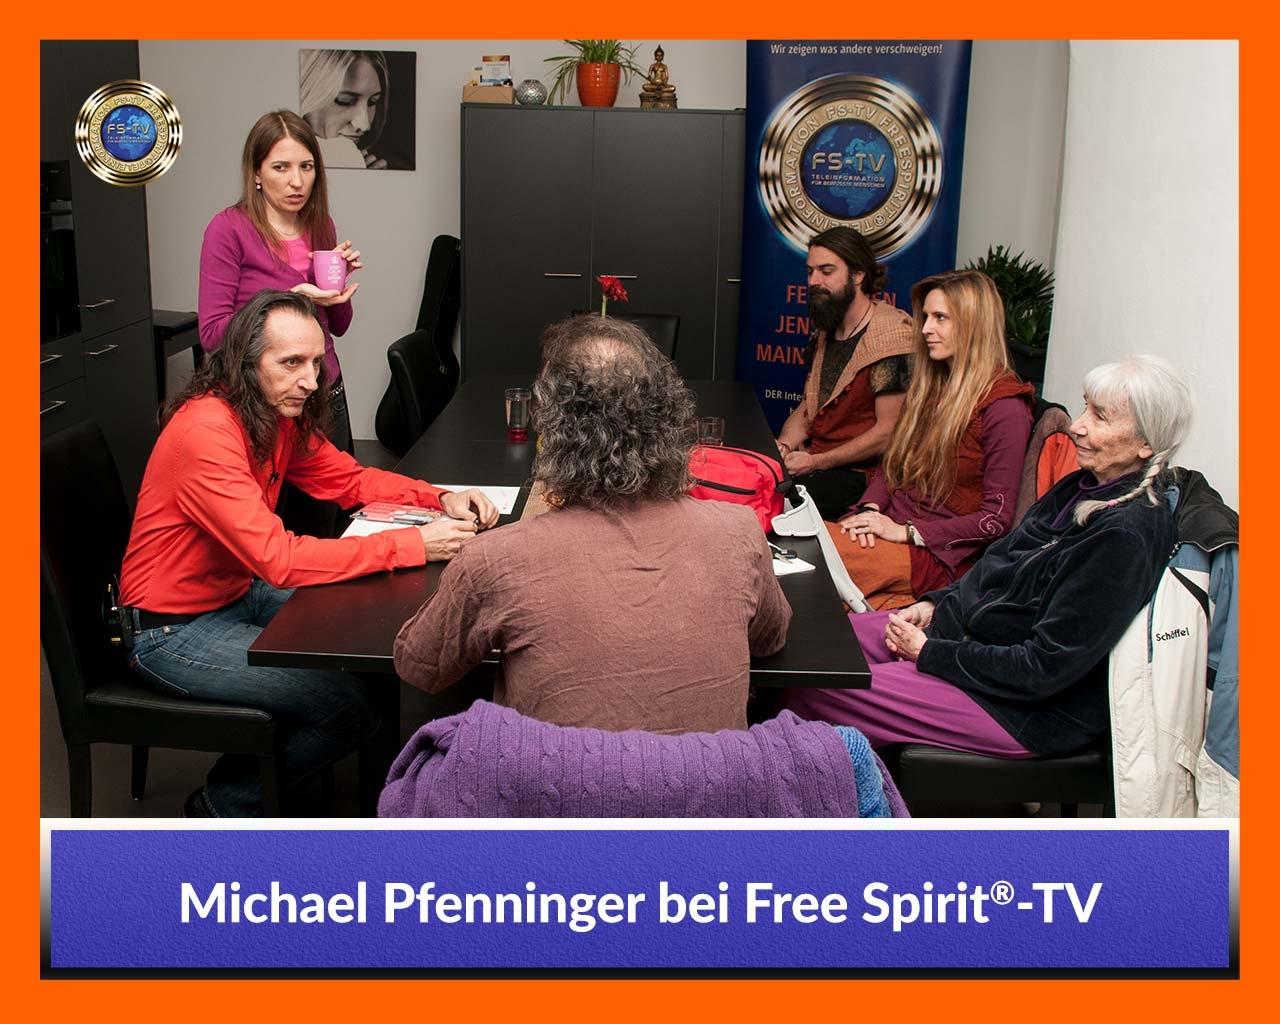 Michael-Pfenninger-04